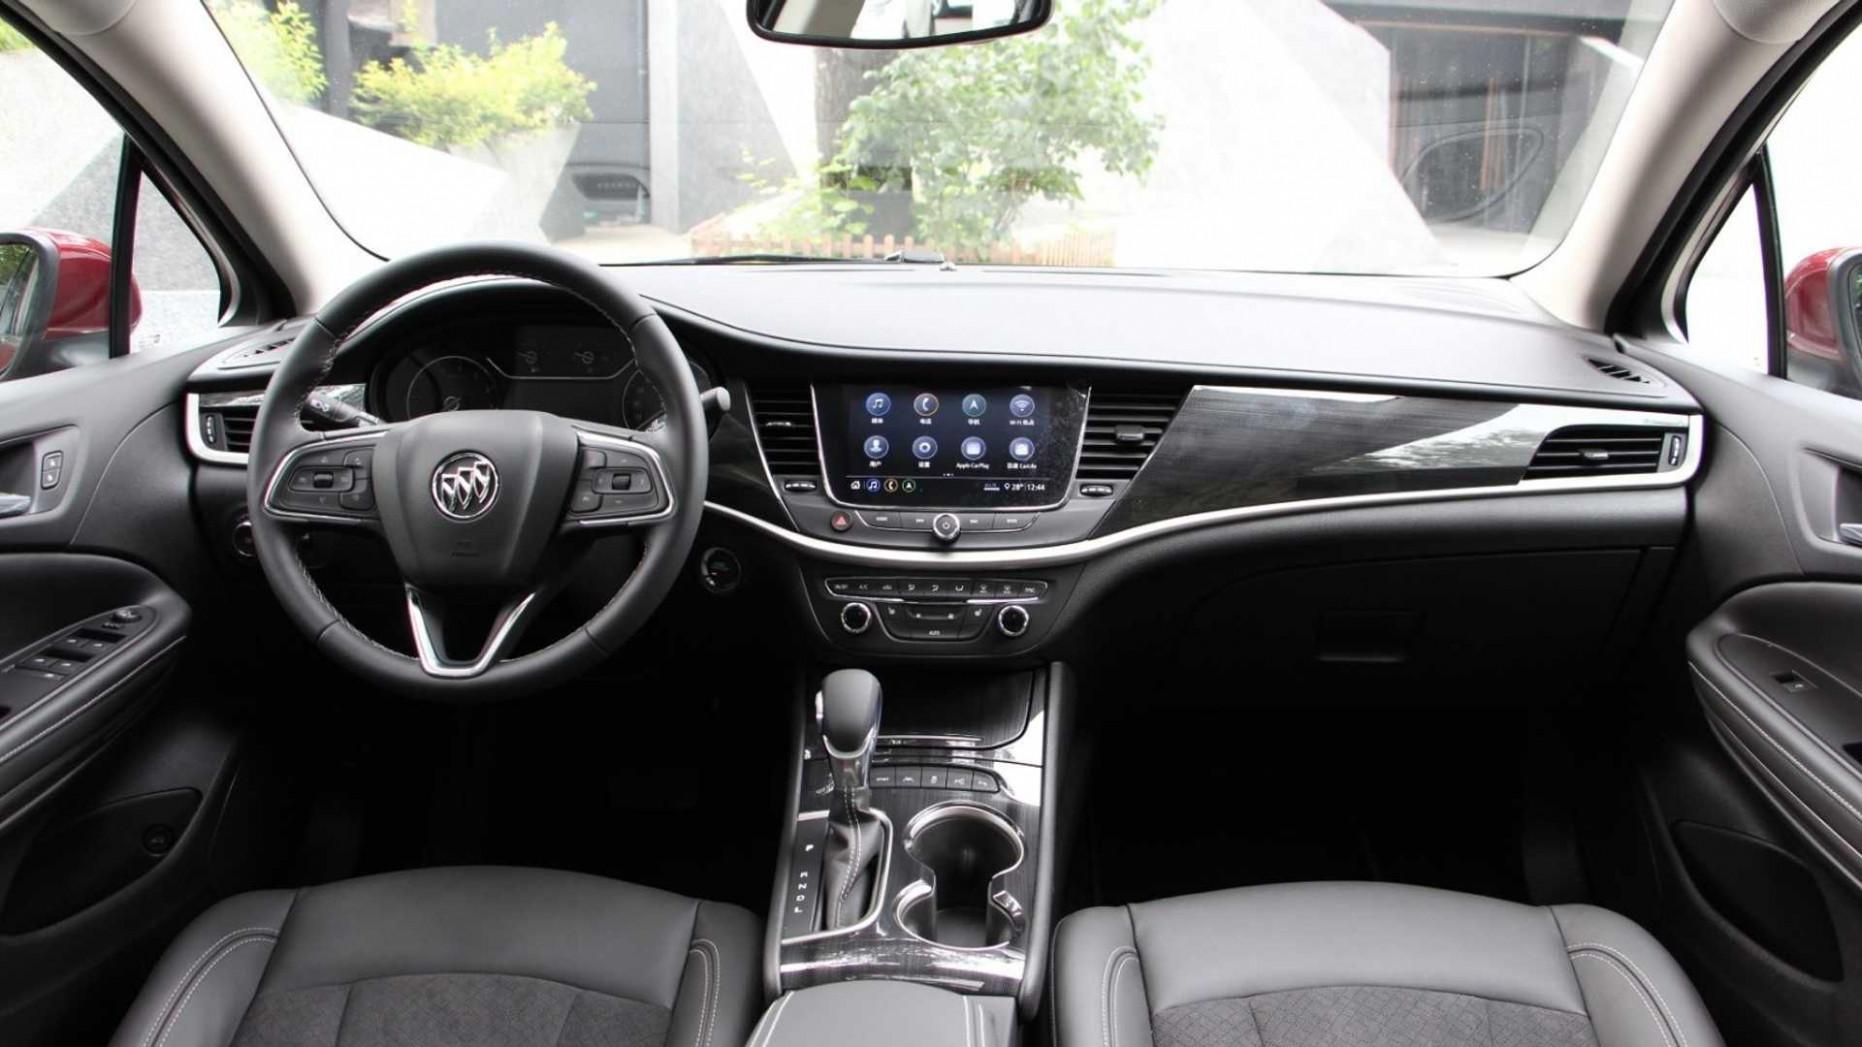 Overview 2022 Buick Verano